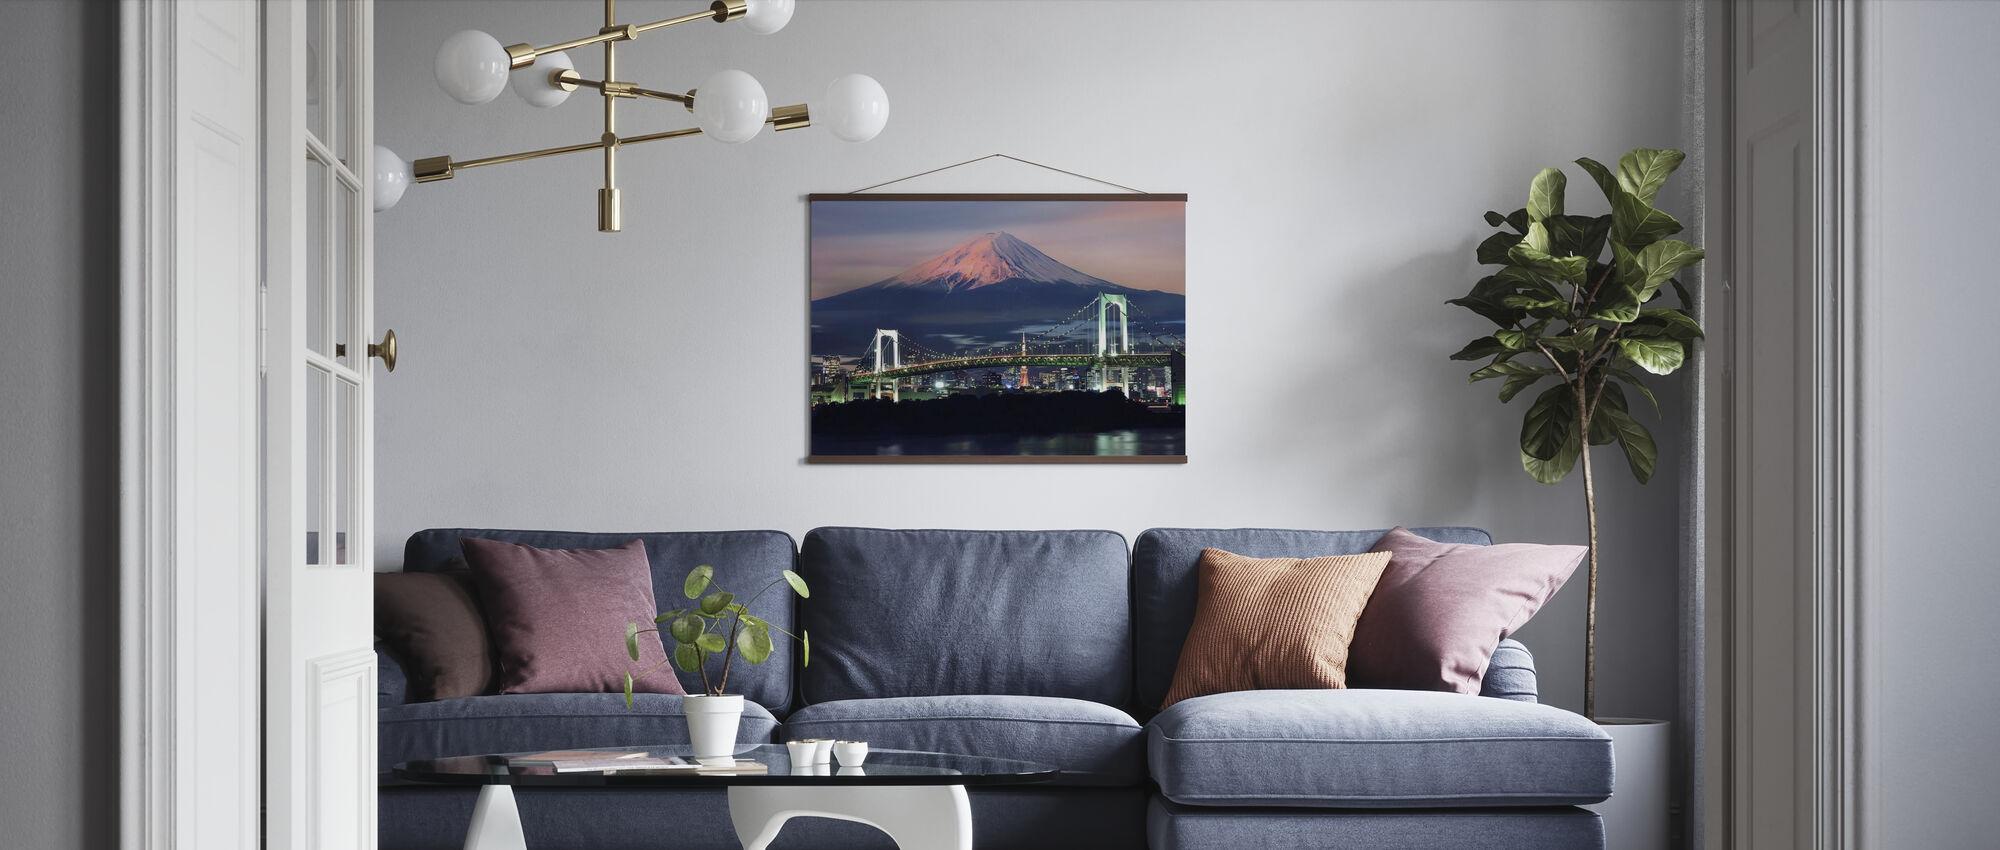 Rainbow Bridge with Mt Fuji - Poster - Living Room